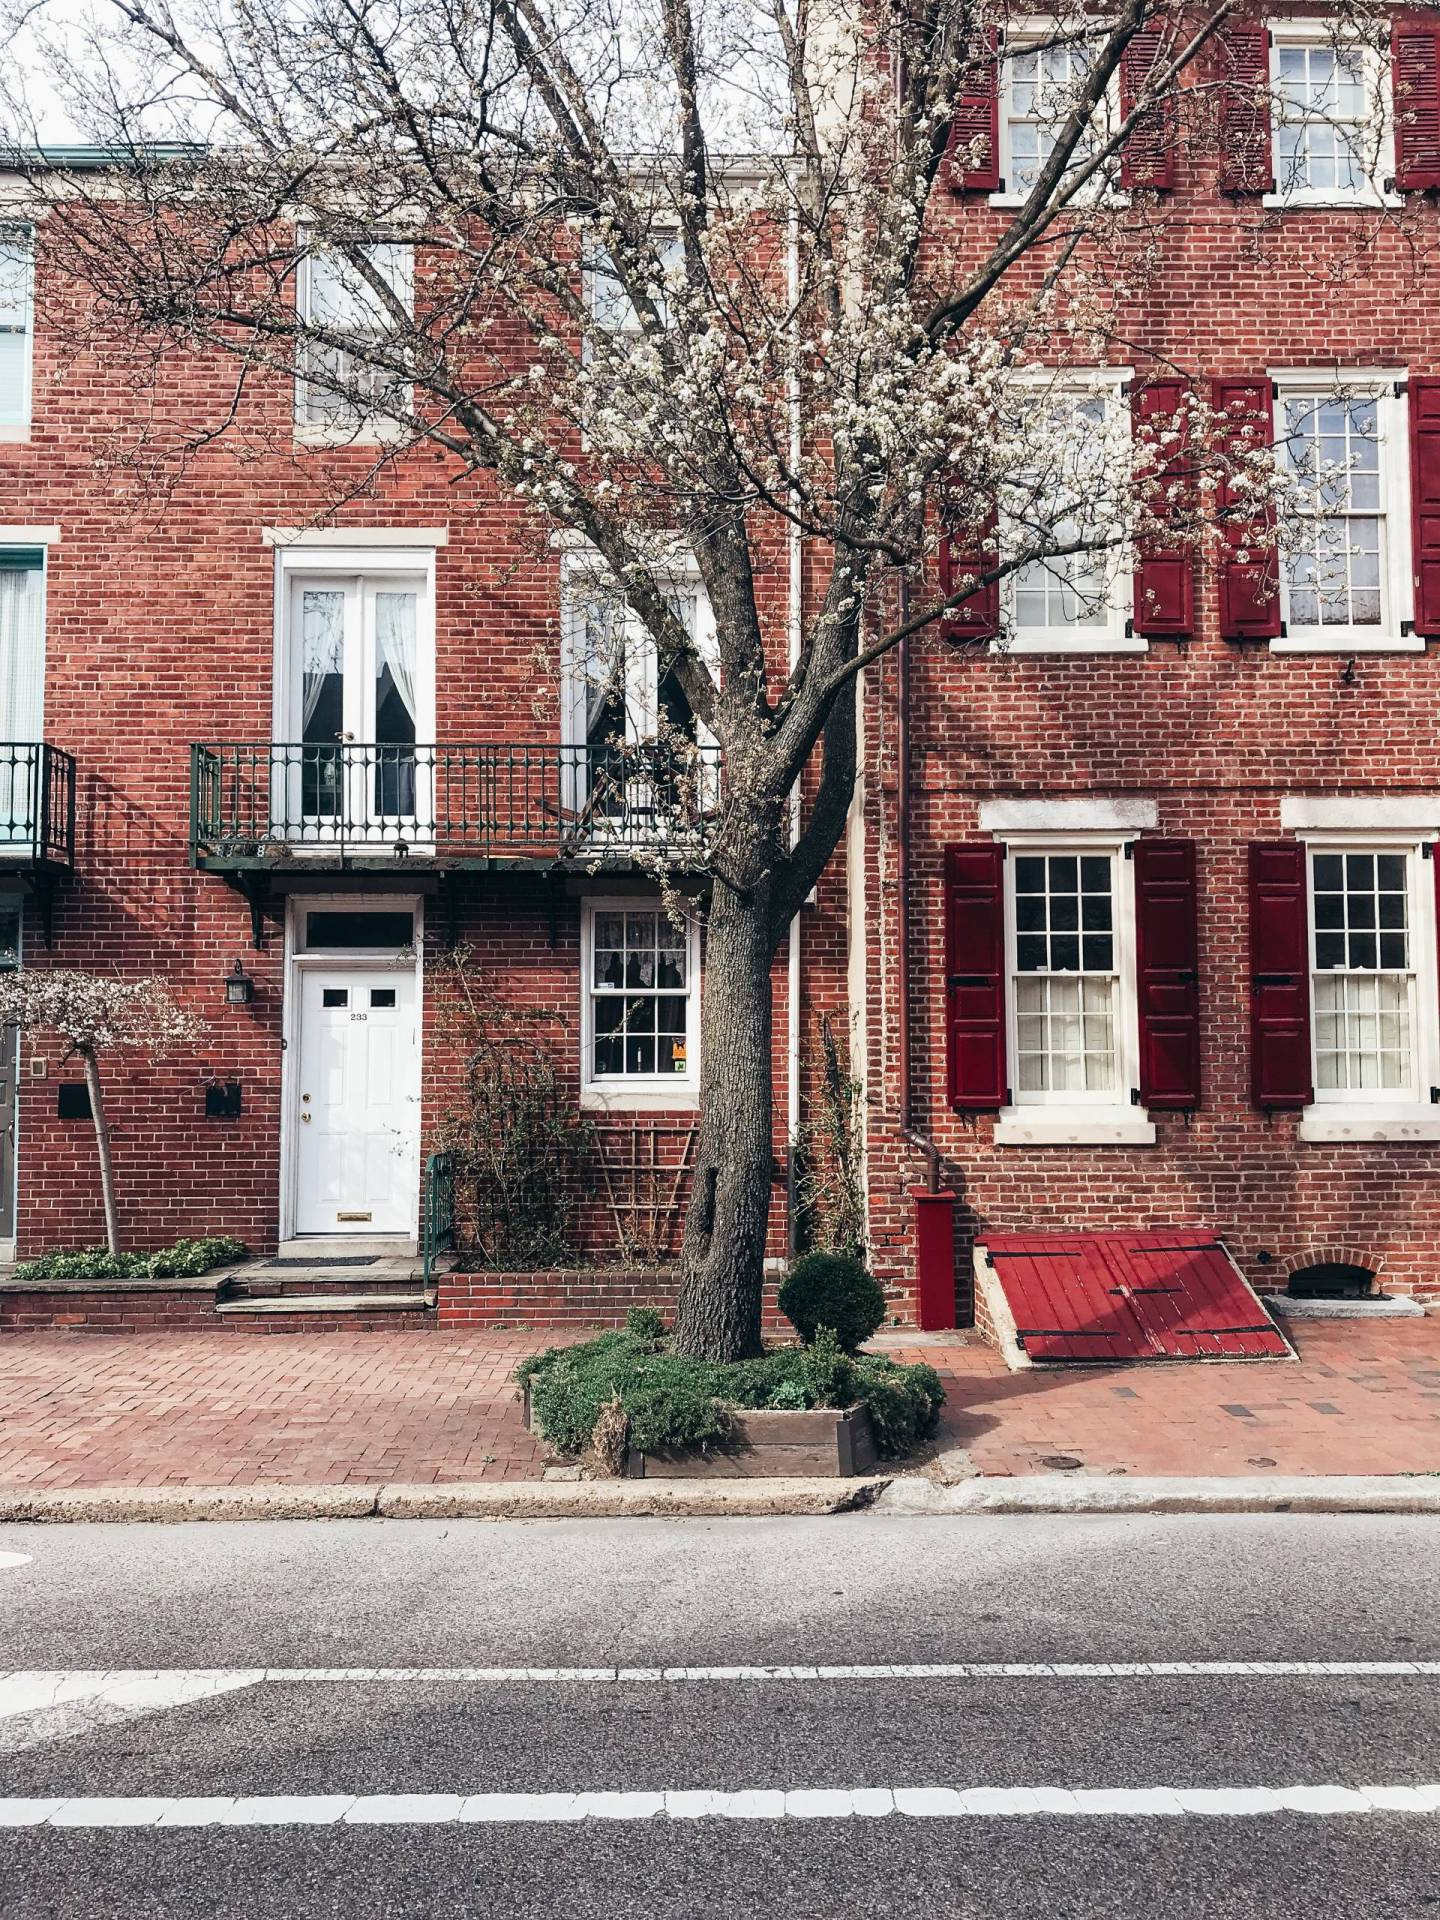 Homes of Society Hill Philadelphia